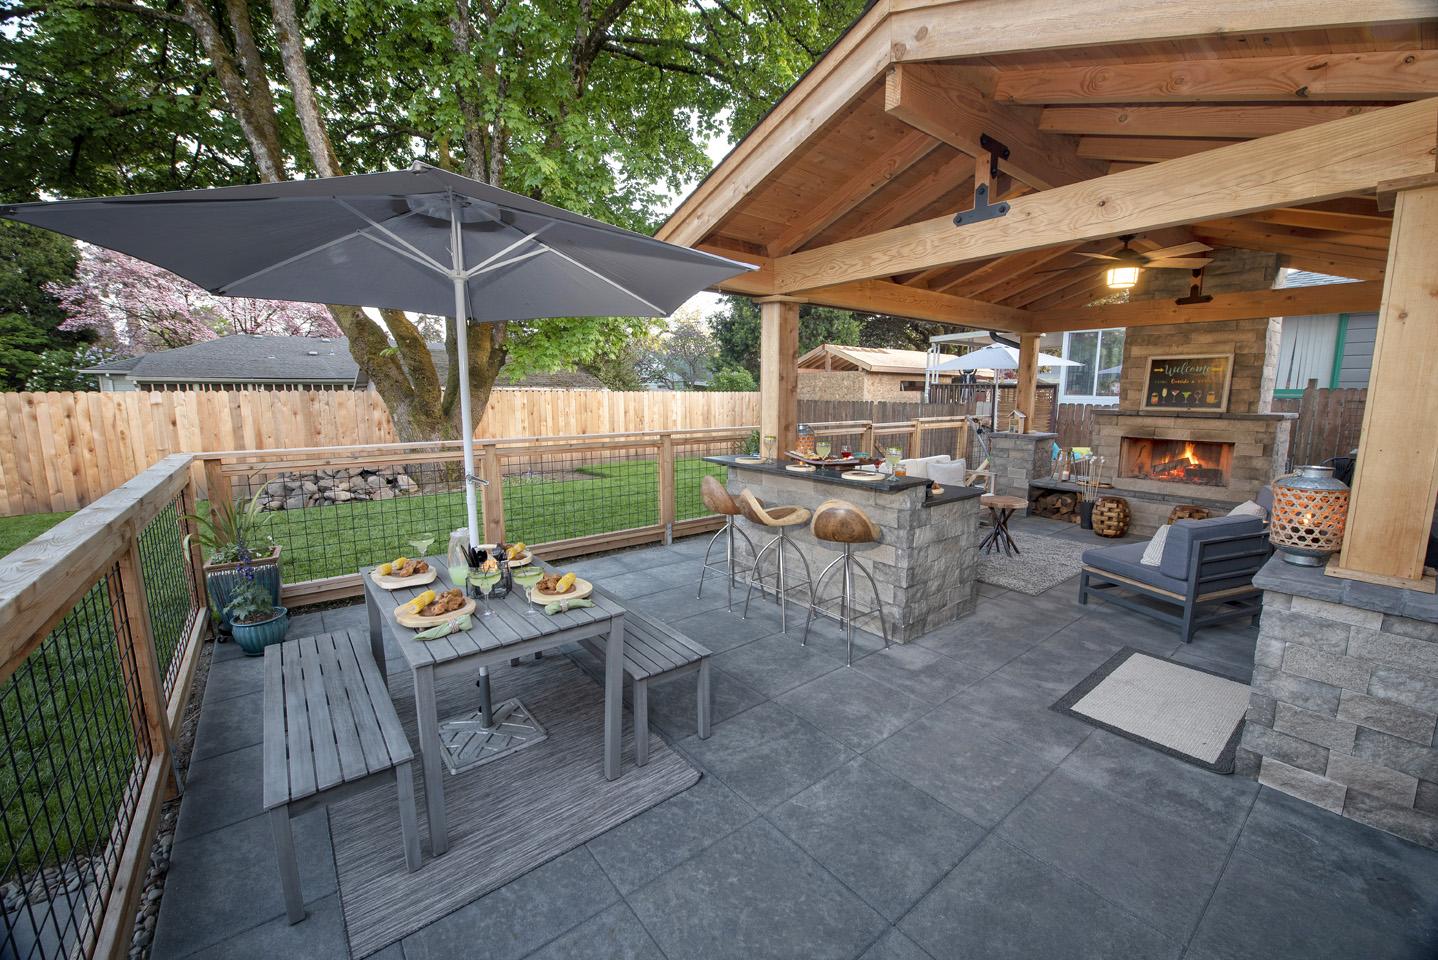 Backyard Patio Designs - Paradise Restored Landscaping on Backyard Patio Designs  id=37239